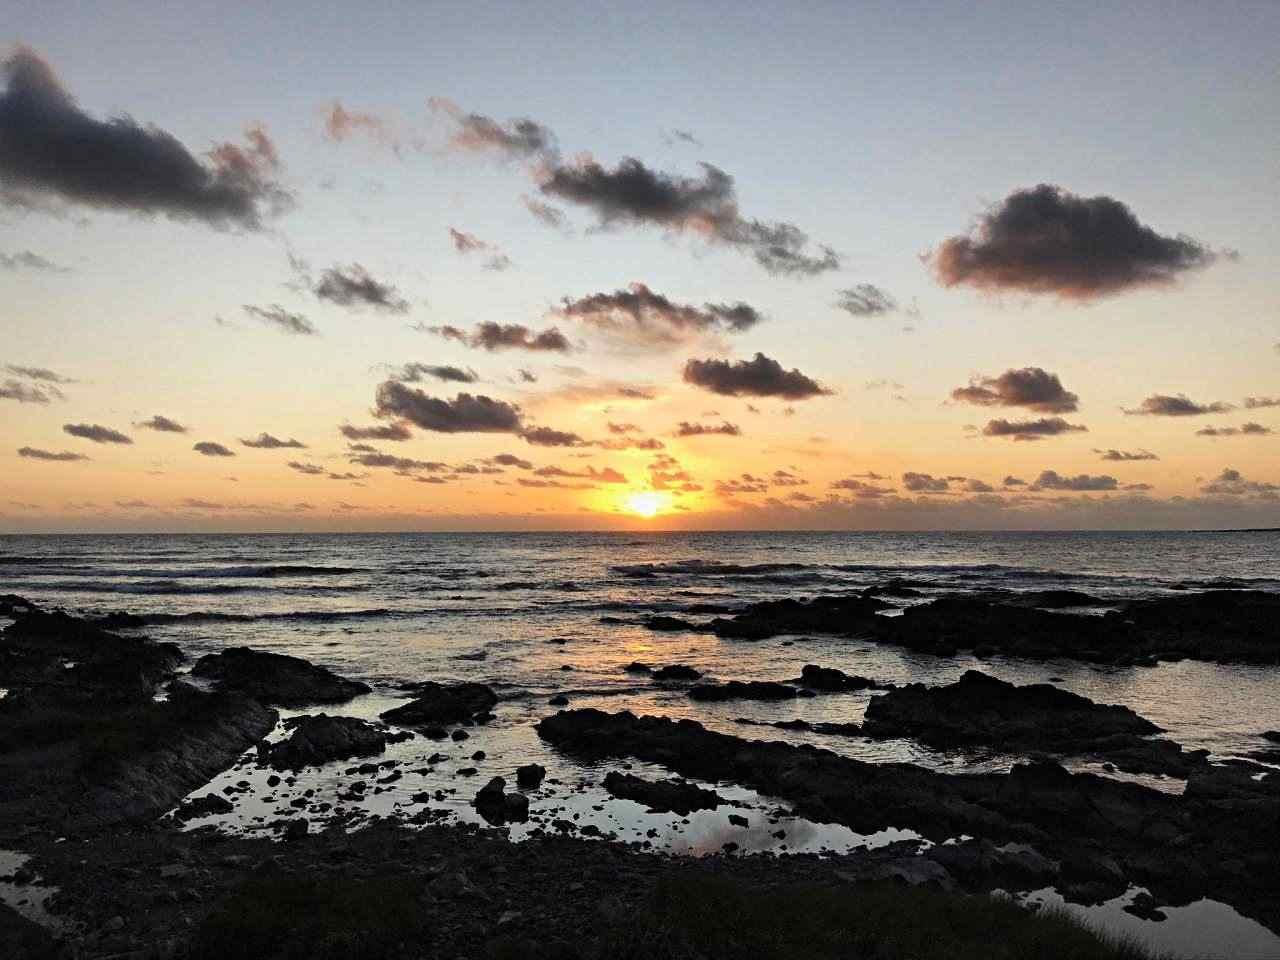 Pôr-do-sol em Punta del Este - Uruguai